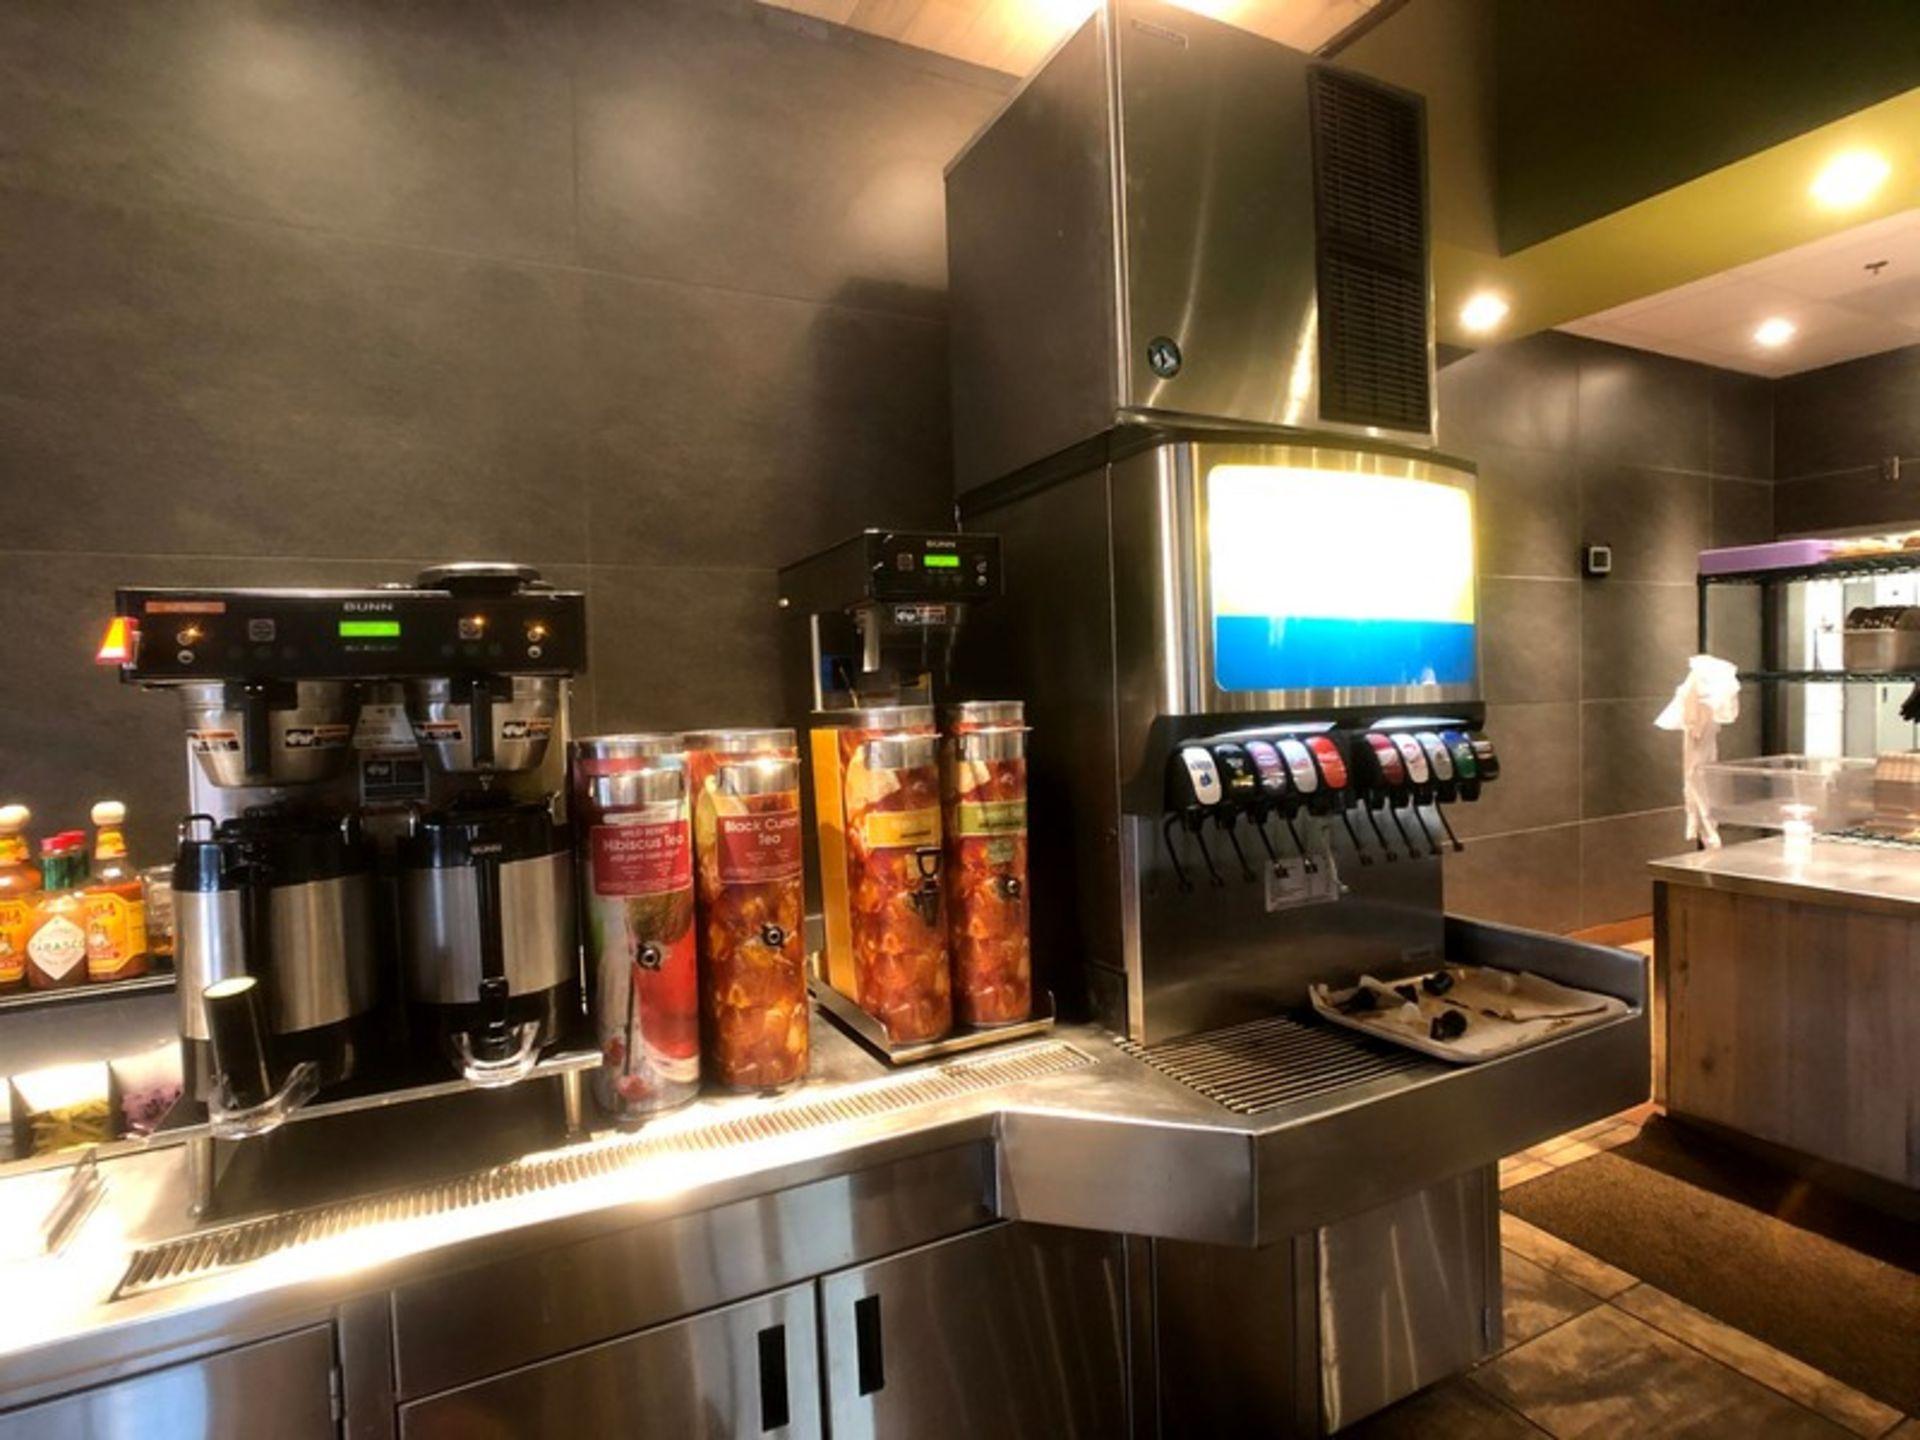 Manitowoc Beverage Systems 10-Valve Soft Drink Dispenser, Model SV250, S/N 610202454, with Hoshizaki - Image 9 of 10